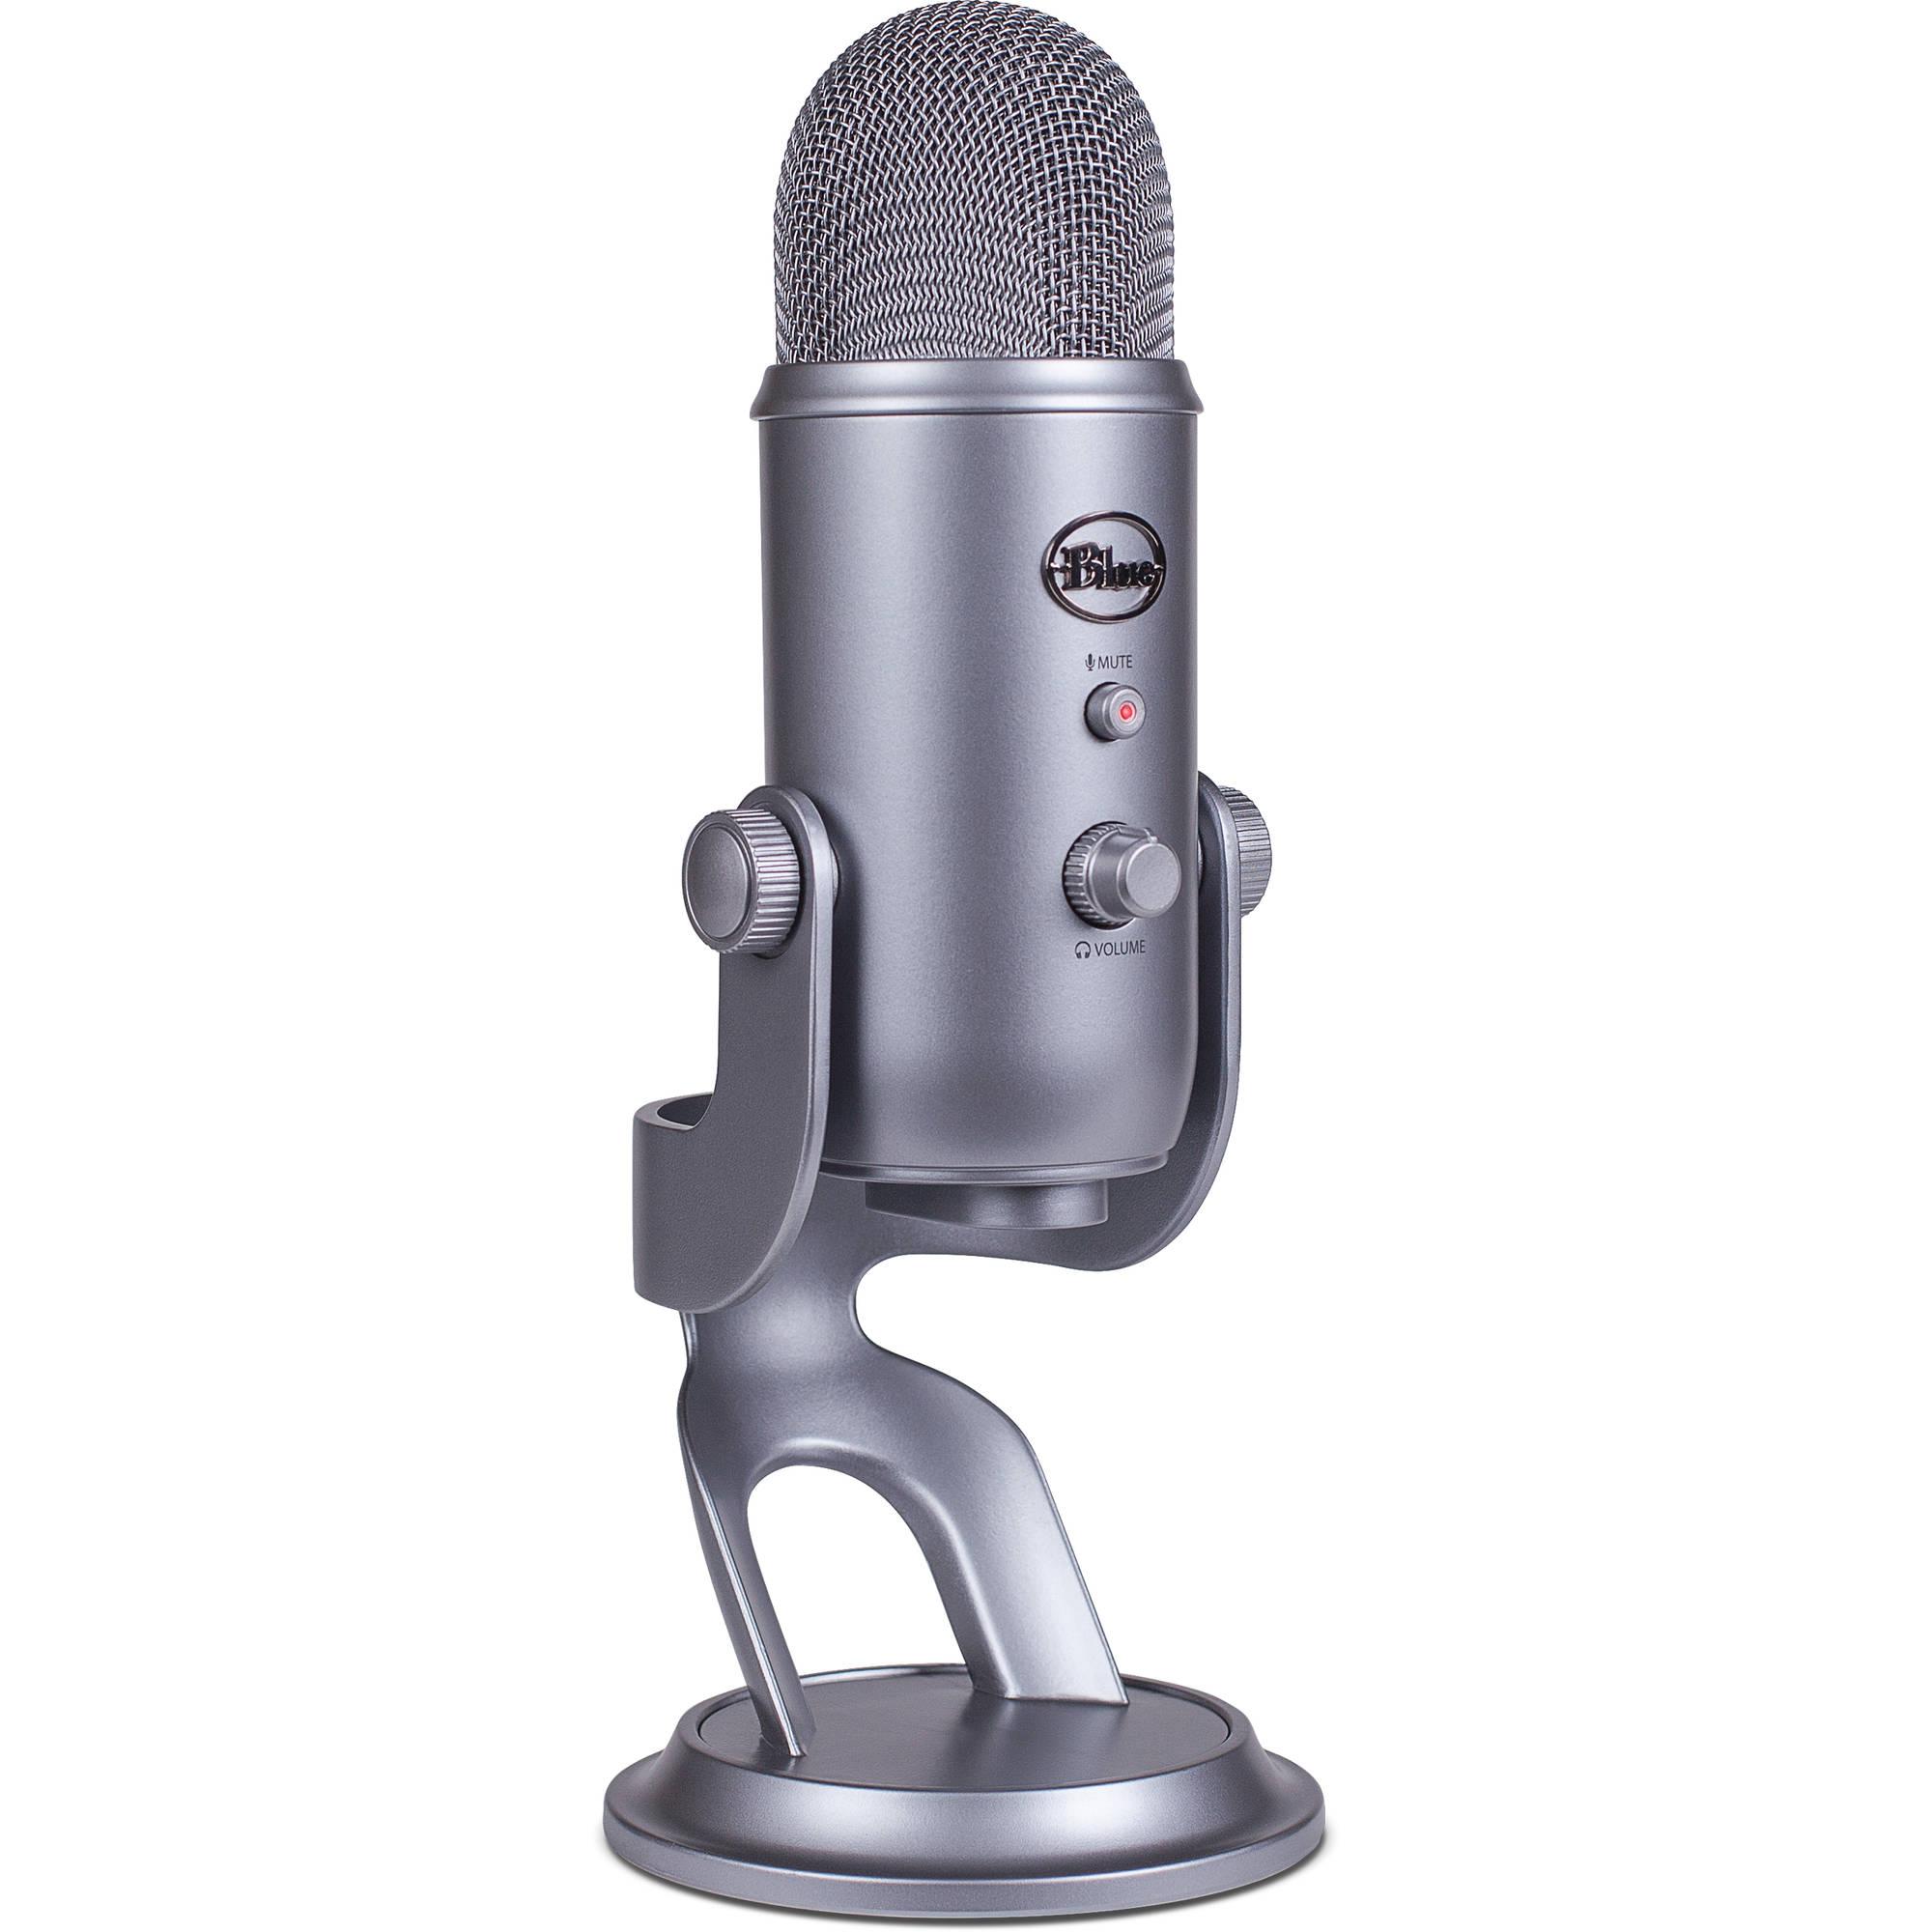 Blue Yeti USB Microphone (Platinum)